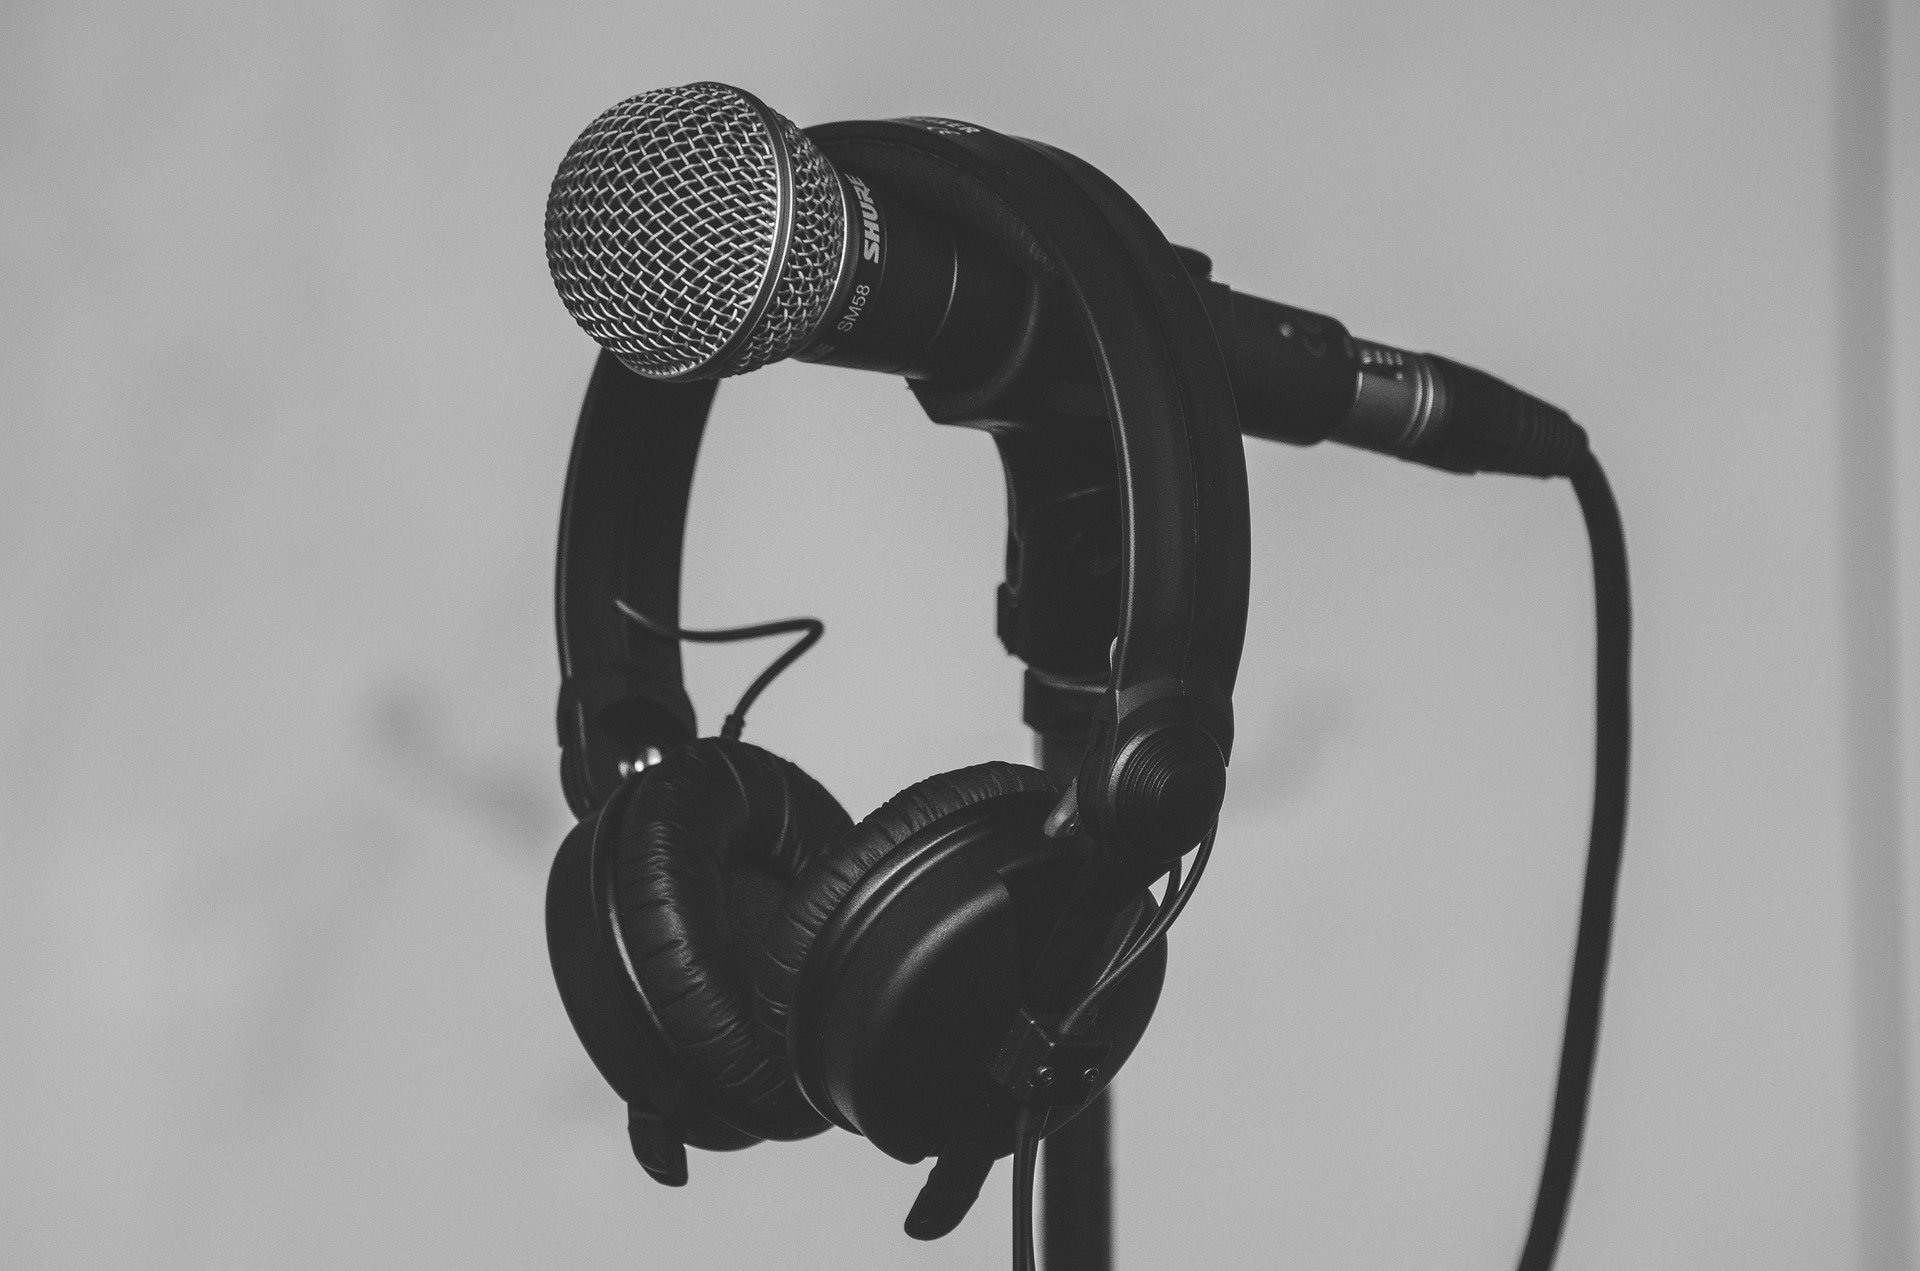 eliminar ruido de fondo microfono en linux